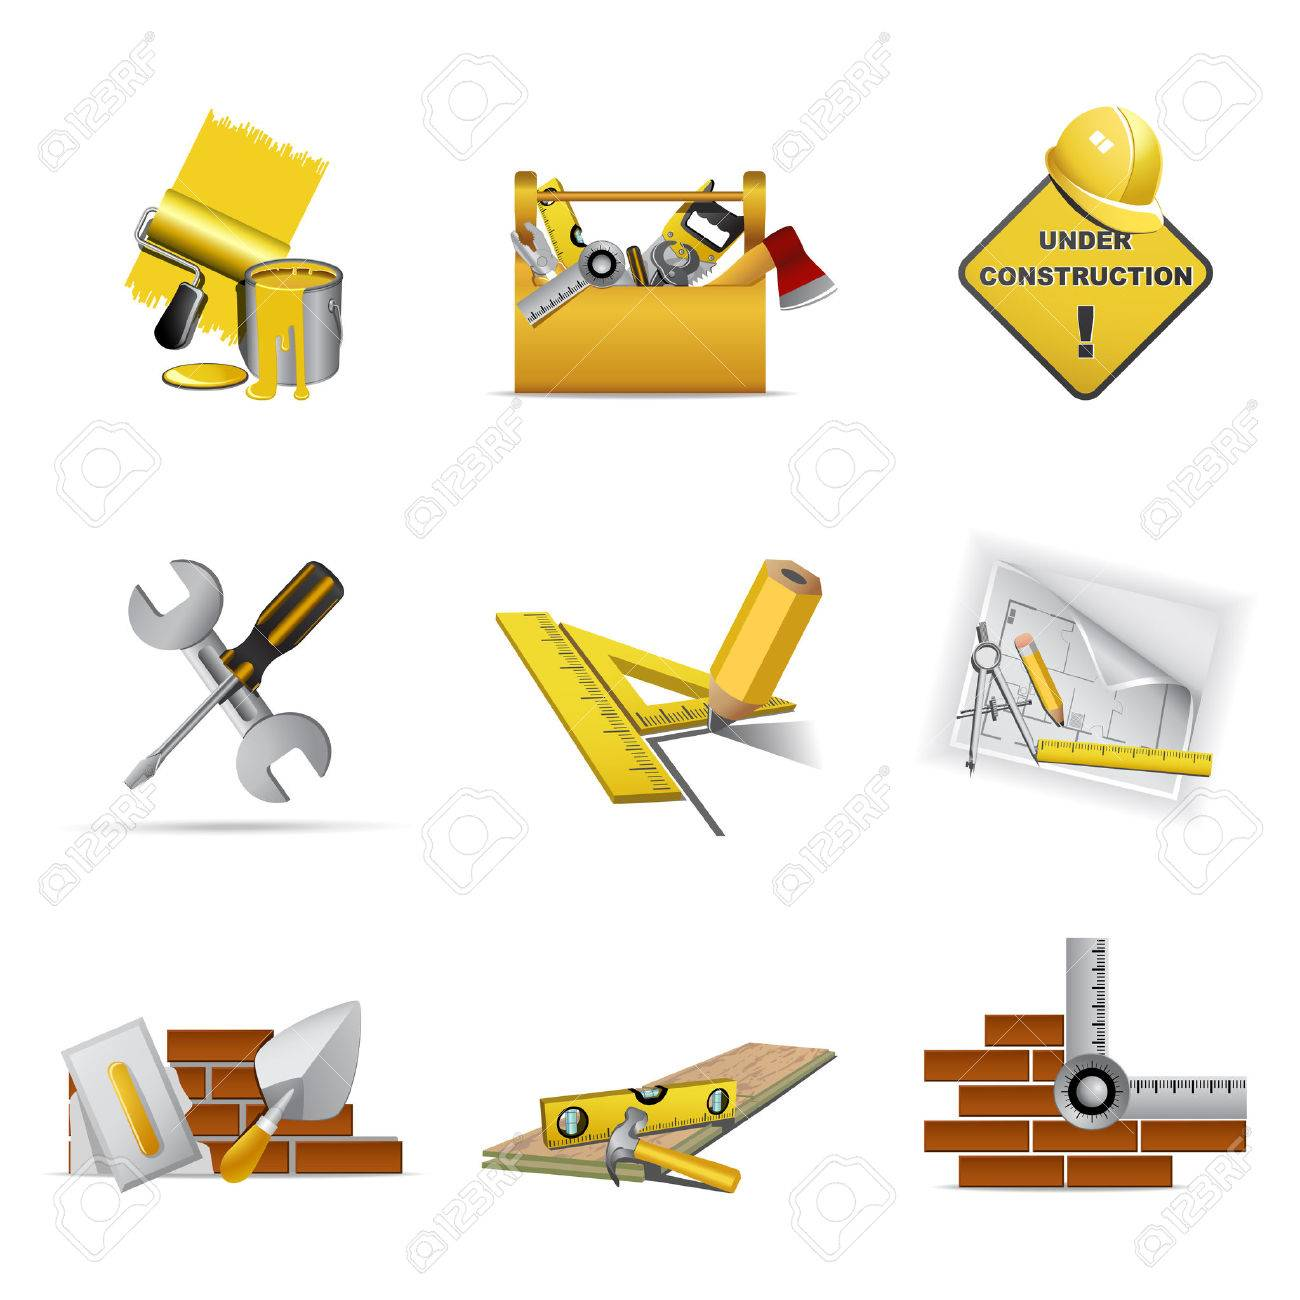 Construction tools, part 1 Stock Vector - 6113241